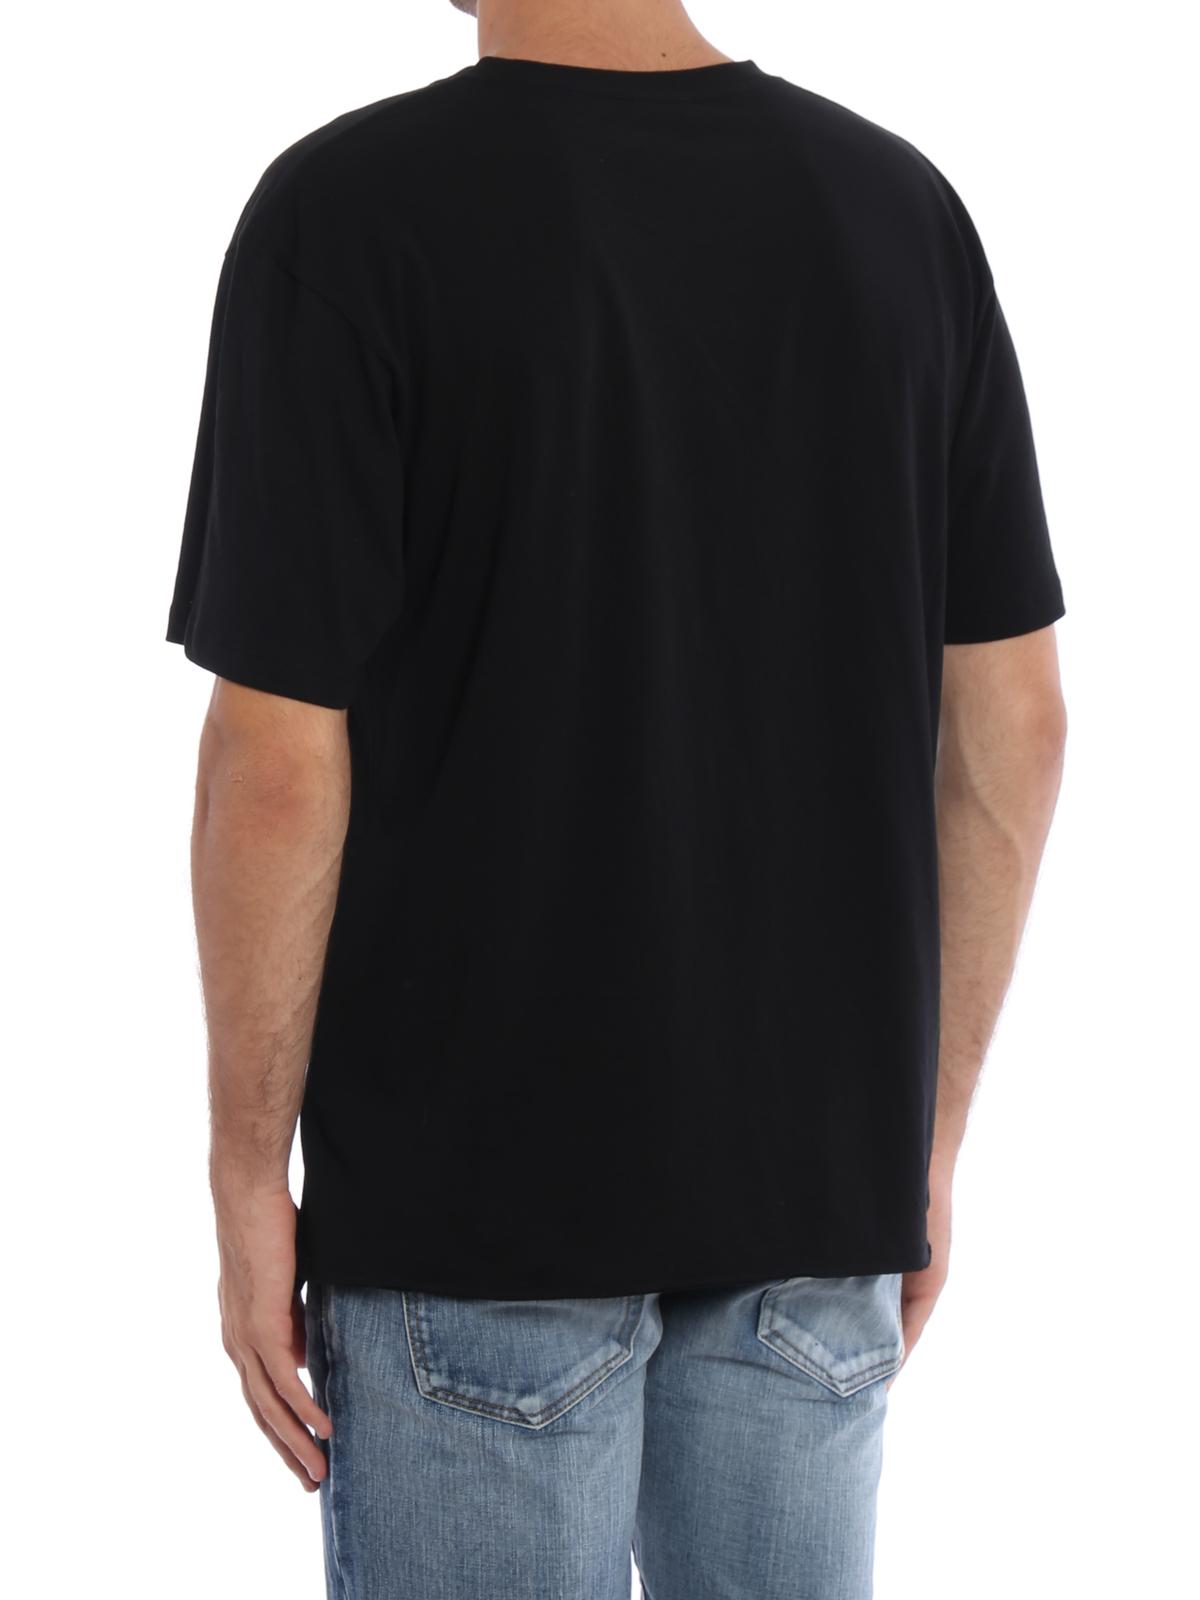 saint laurent t shirt with printed signature t shirts. Black Bedroom Furniture Sets. Home Design Ideas